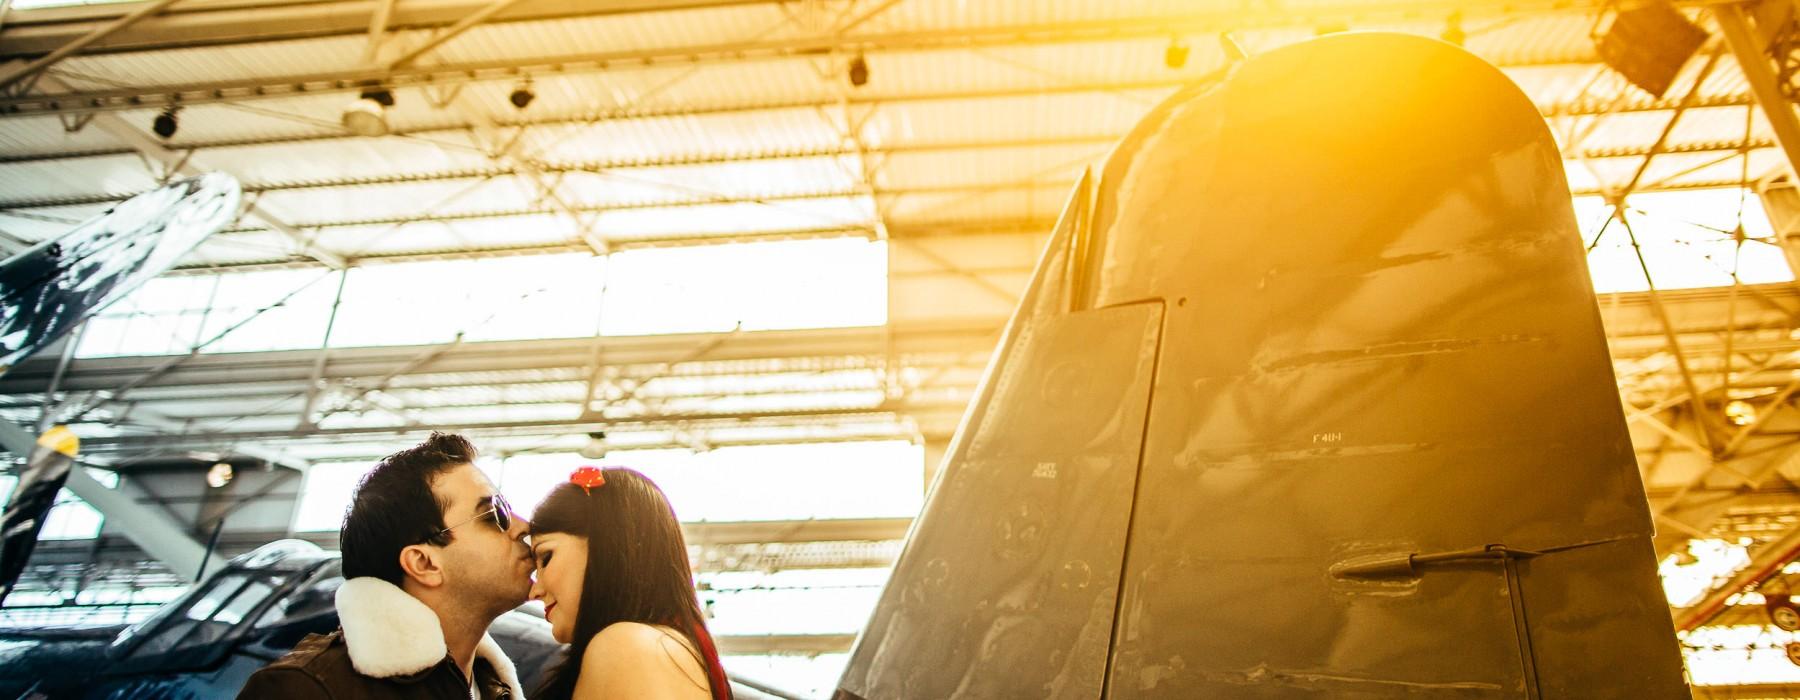 renato dpaula esession ensaio casal aviao aeromoca piloto pre-wedding